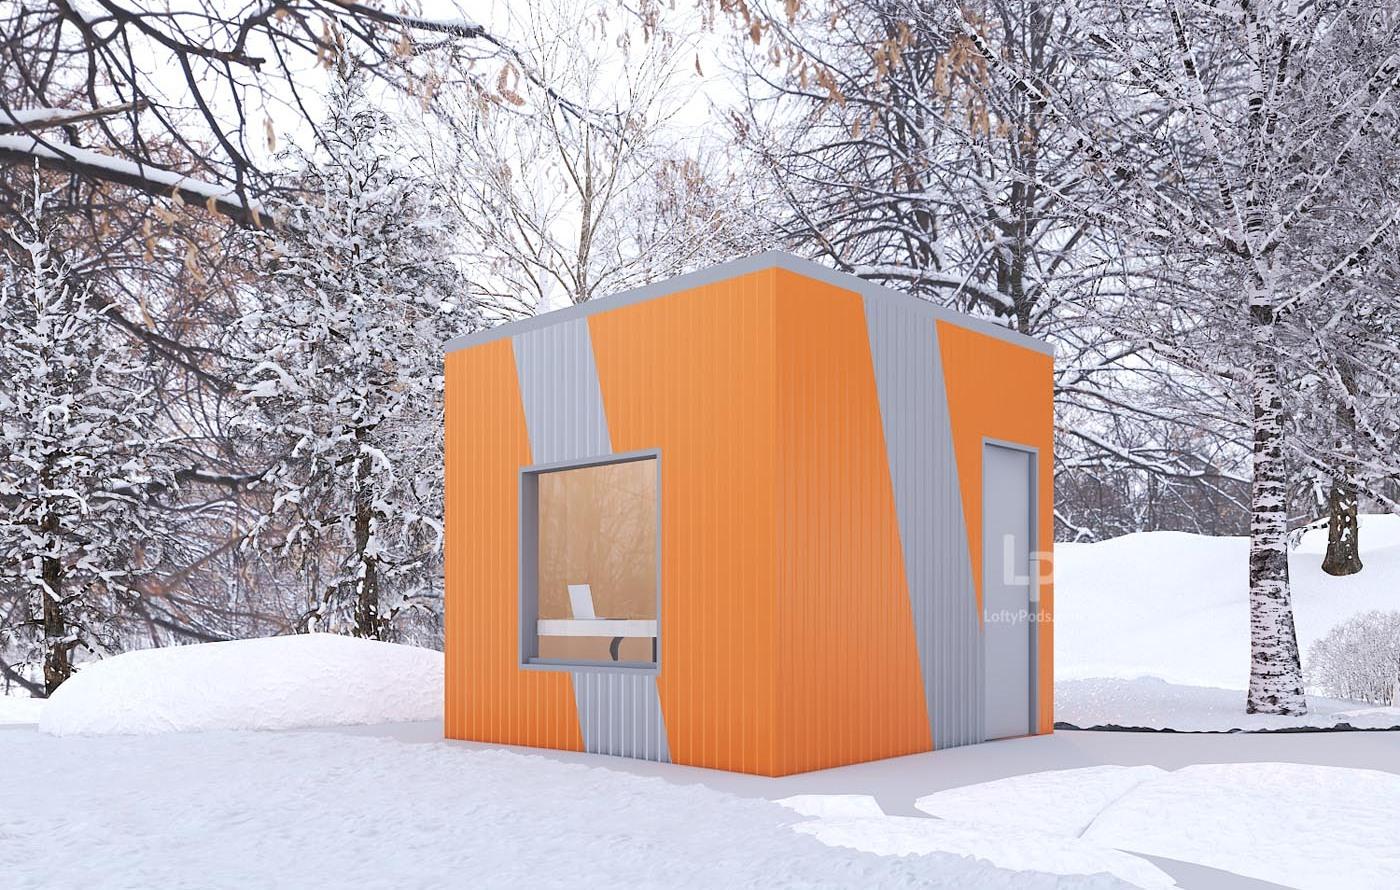 Cabin orange & gray 9